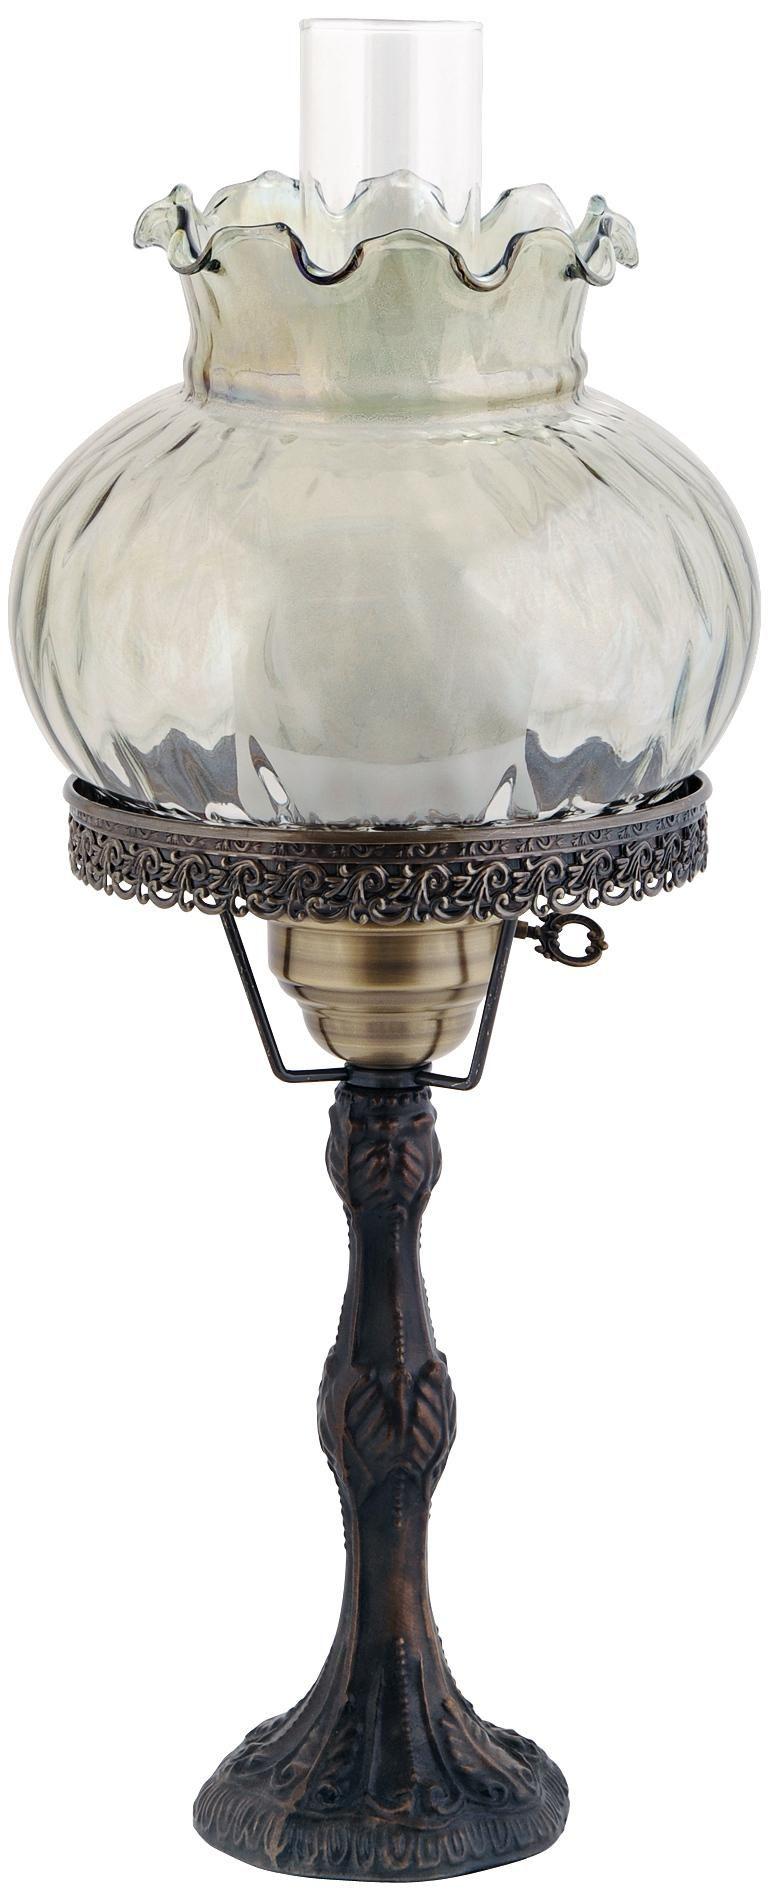 Rhombus Optic Green Shade Brass Hurricane Table Lamp -